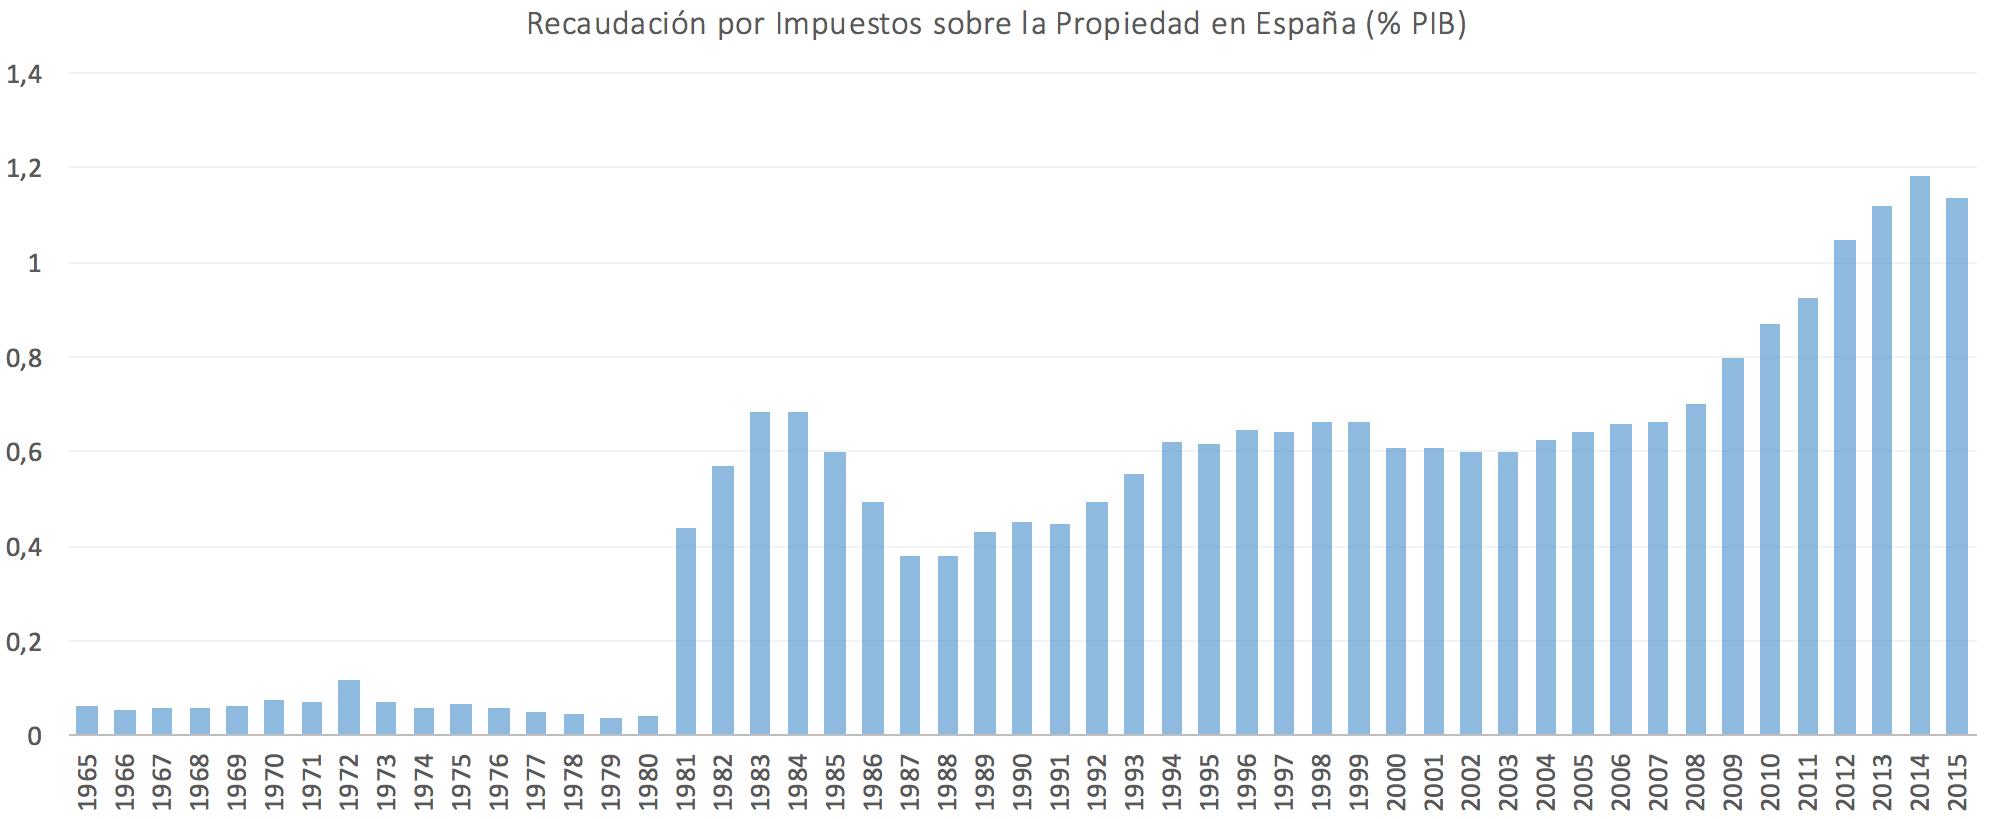 1-Recaudacion-IBI-Espana.png